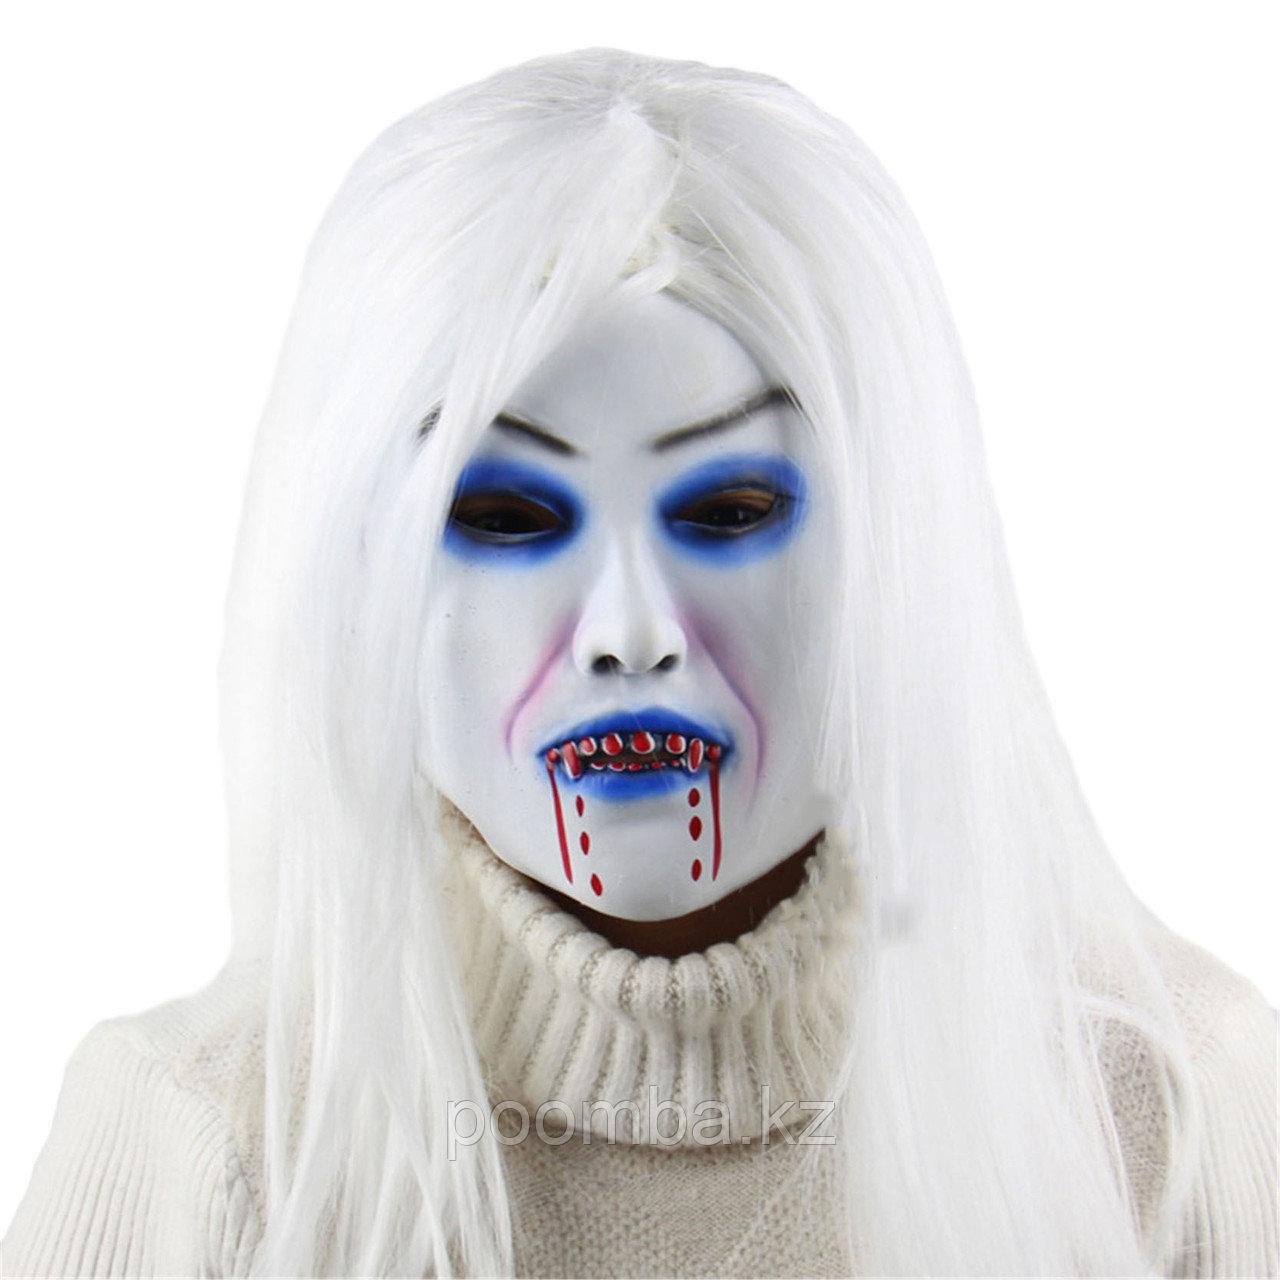 "Маска на хэллоуин ""Зомби с белыми волосами """